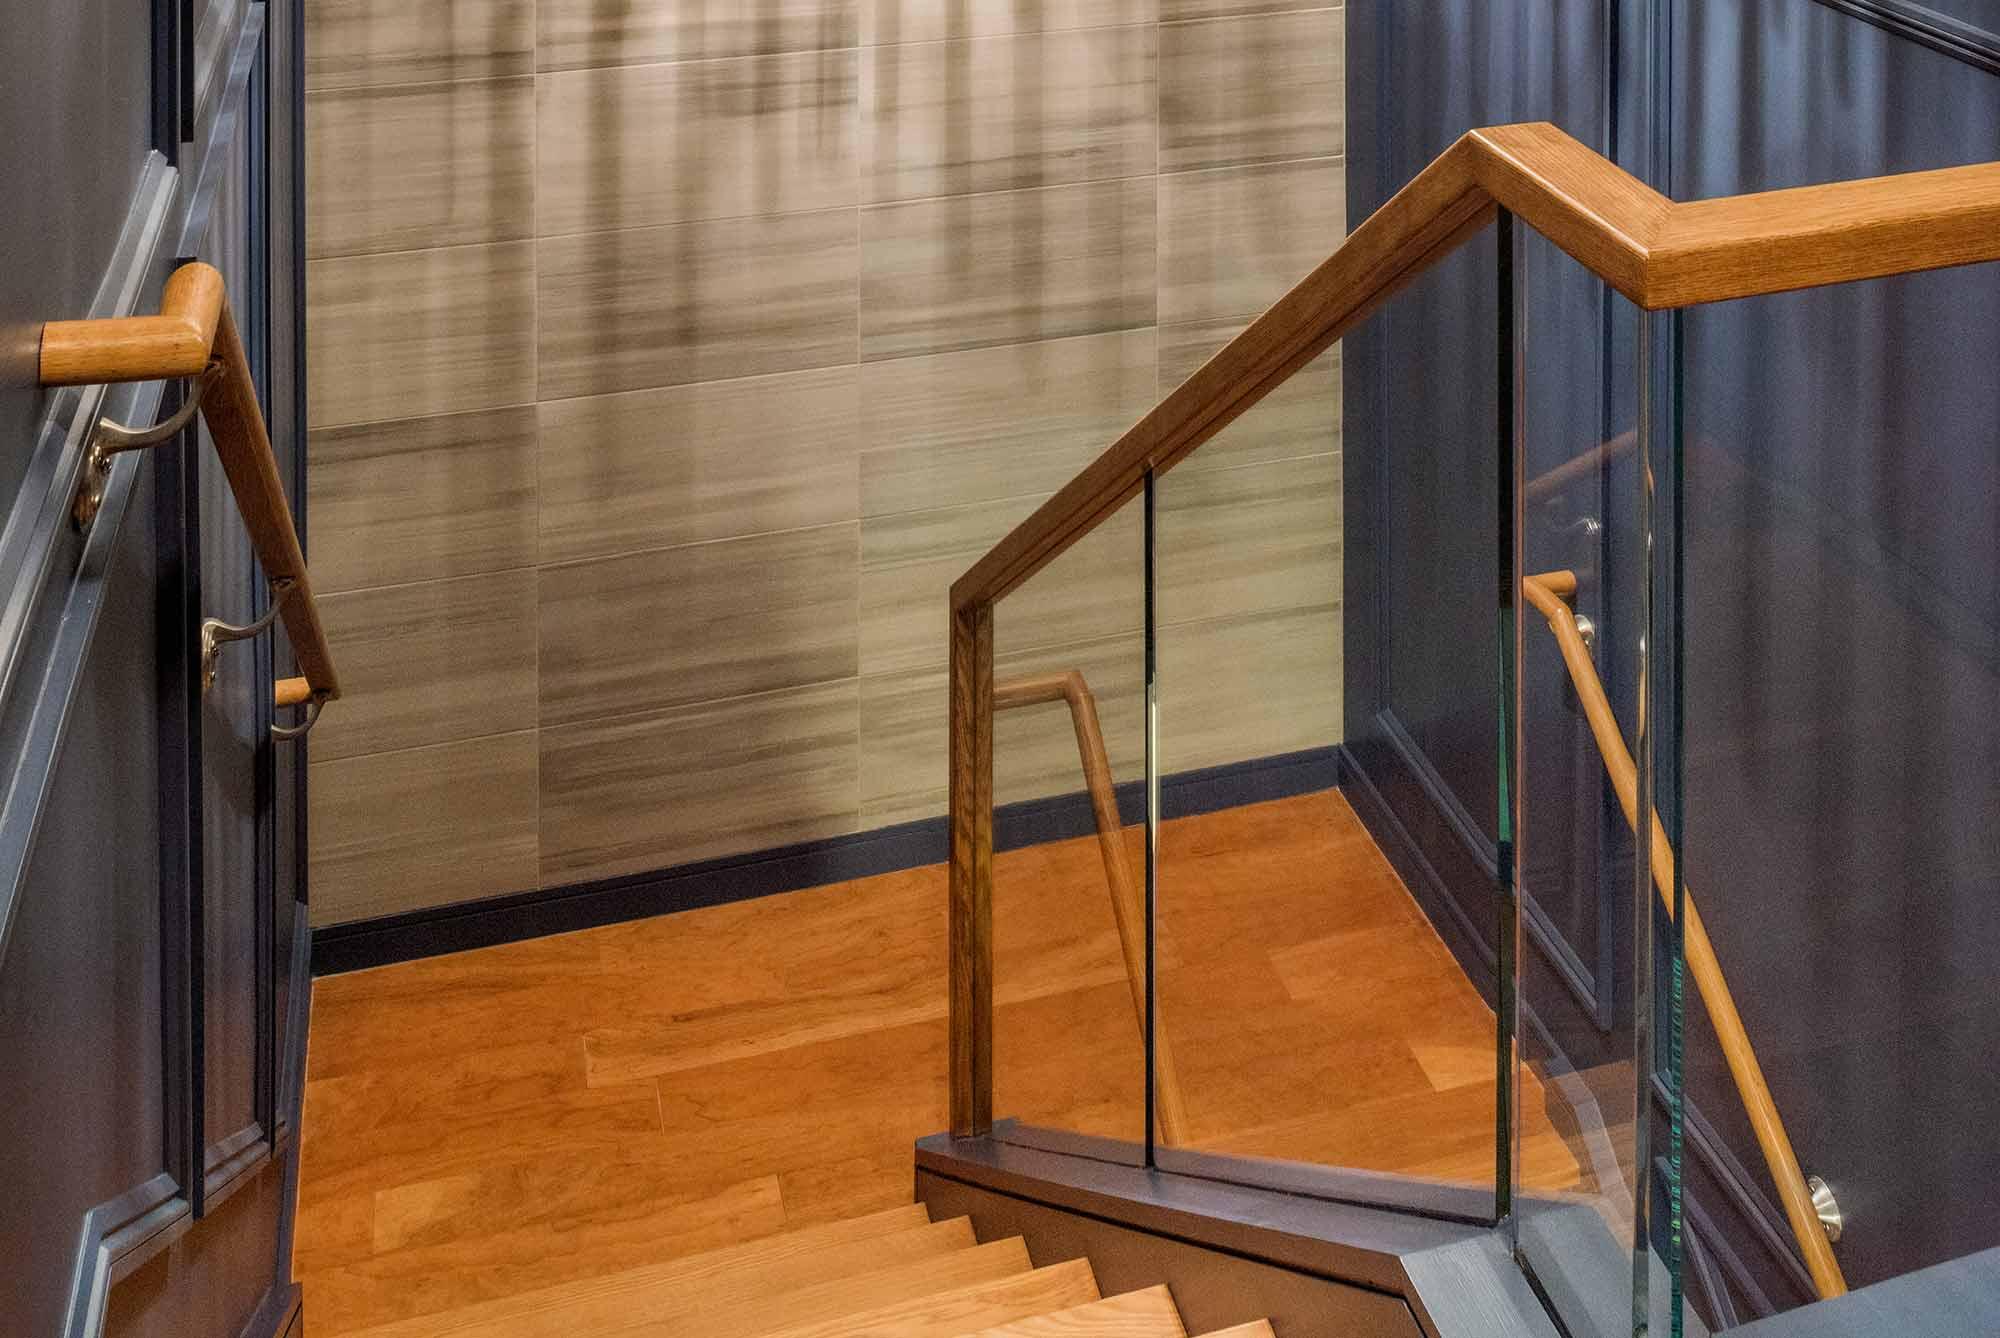 Bautista Staircase